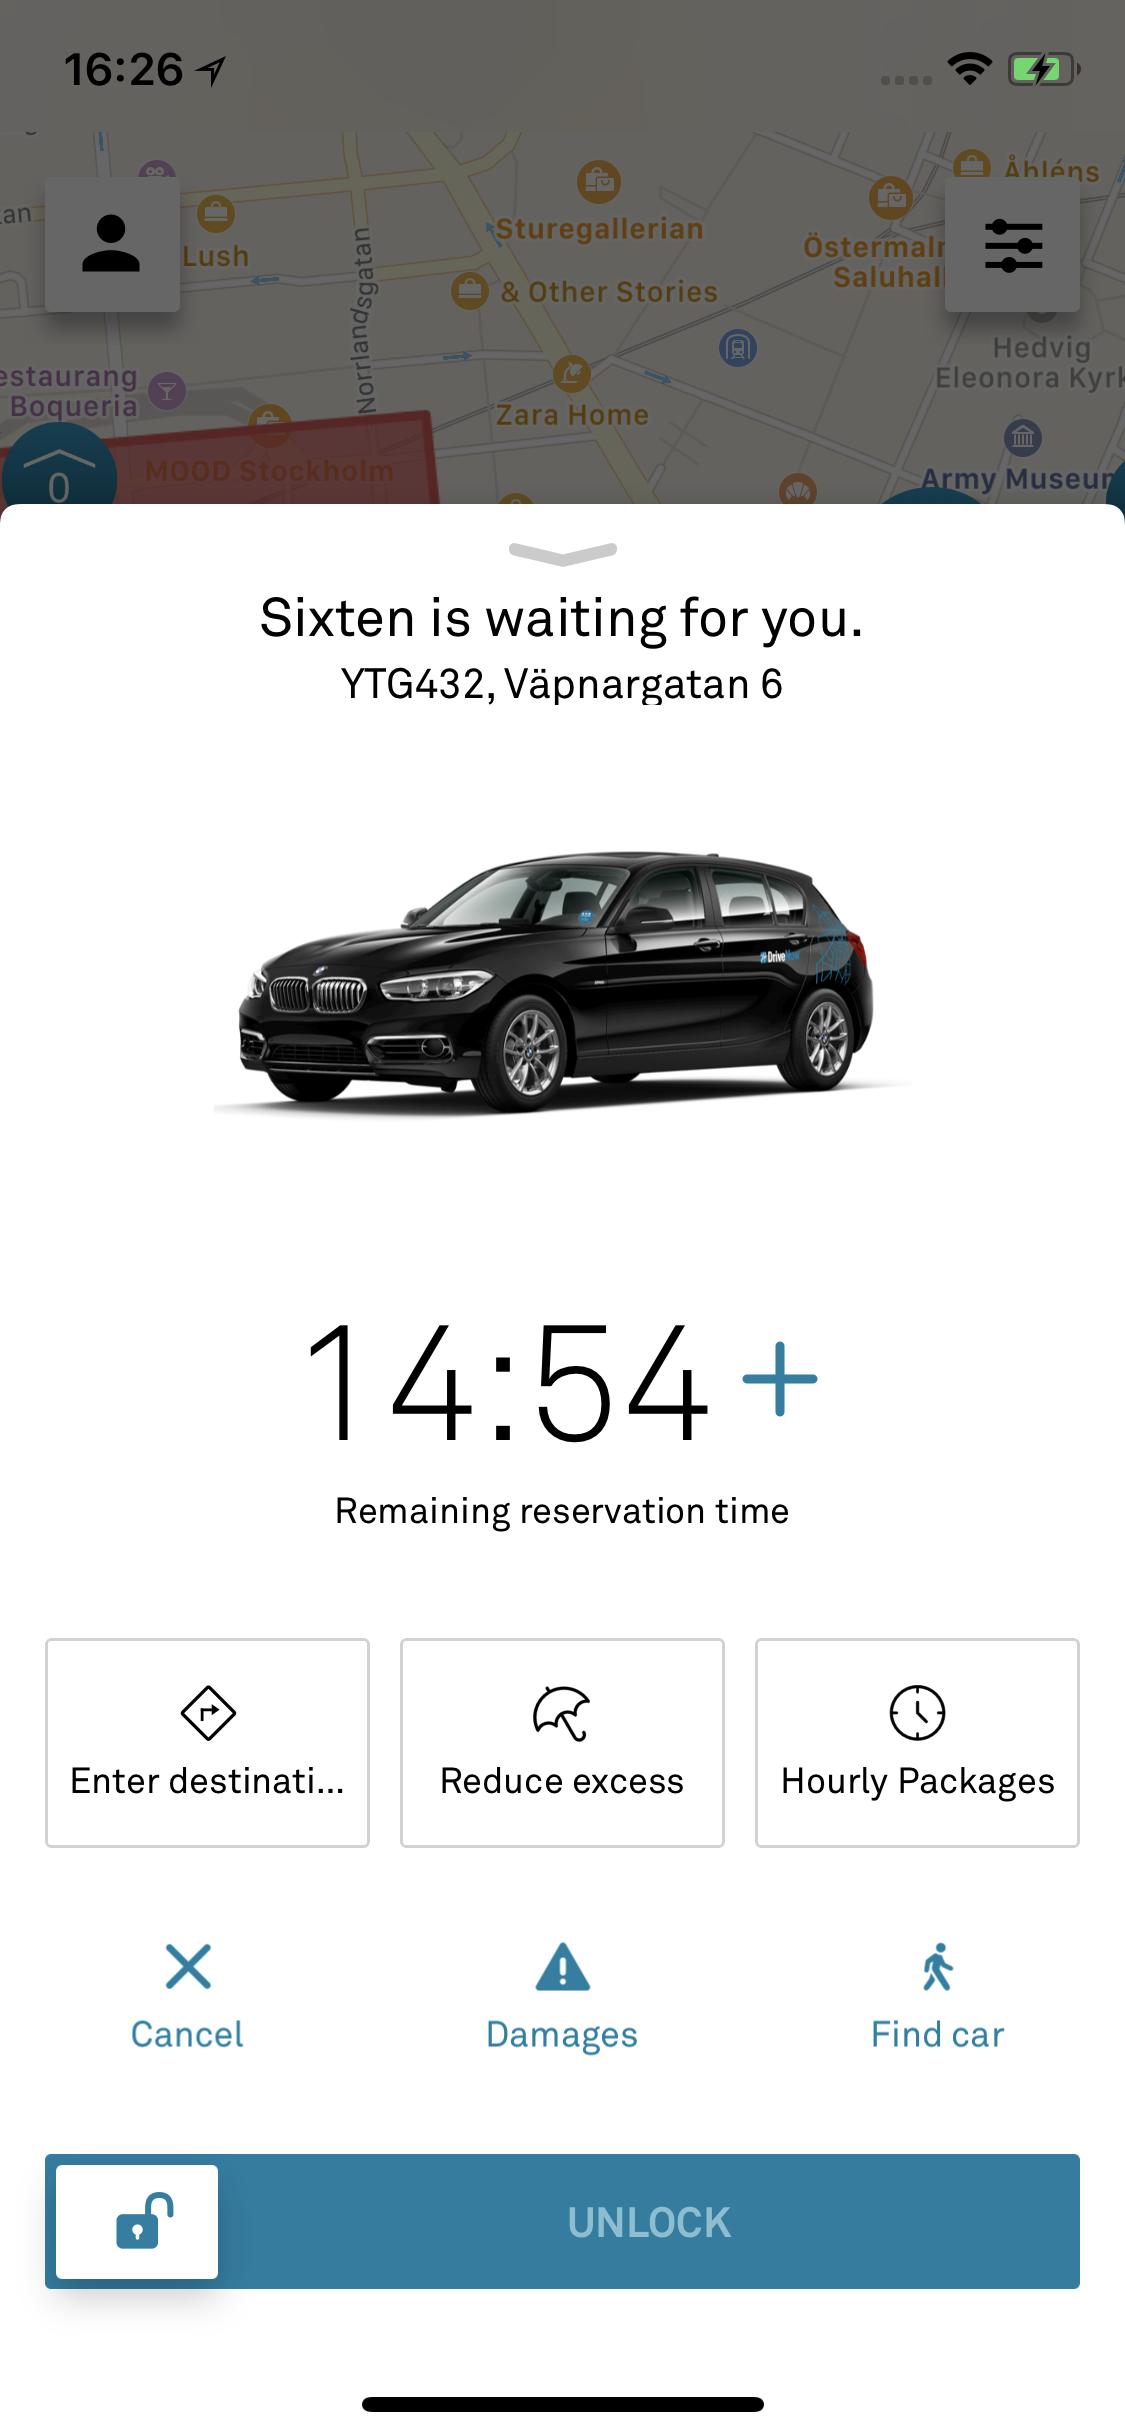 SE_carsharing_tips-und-tricks-plan-trip